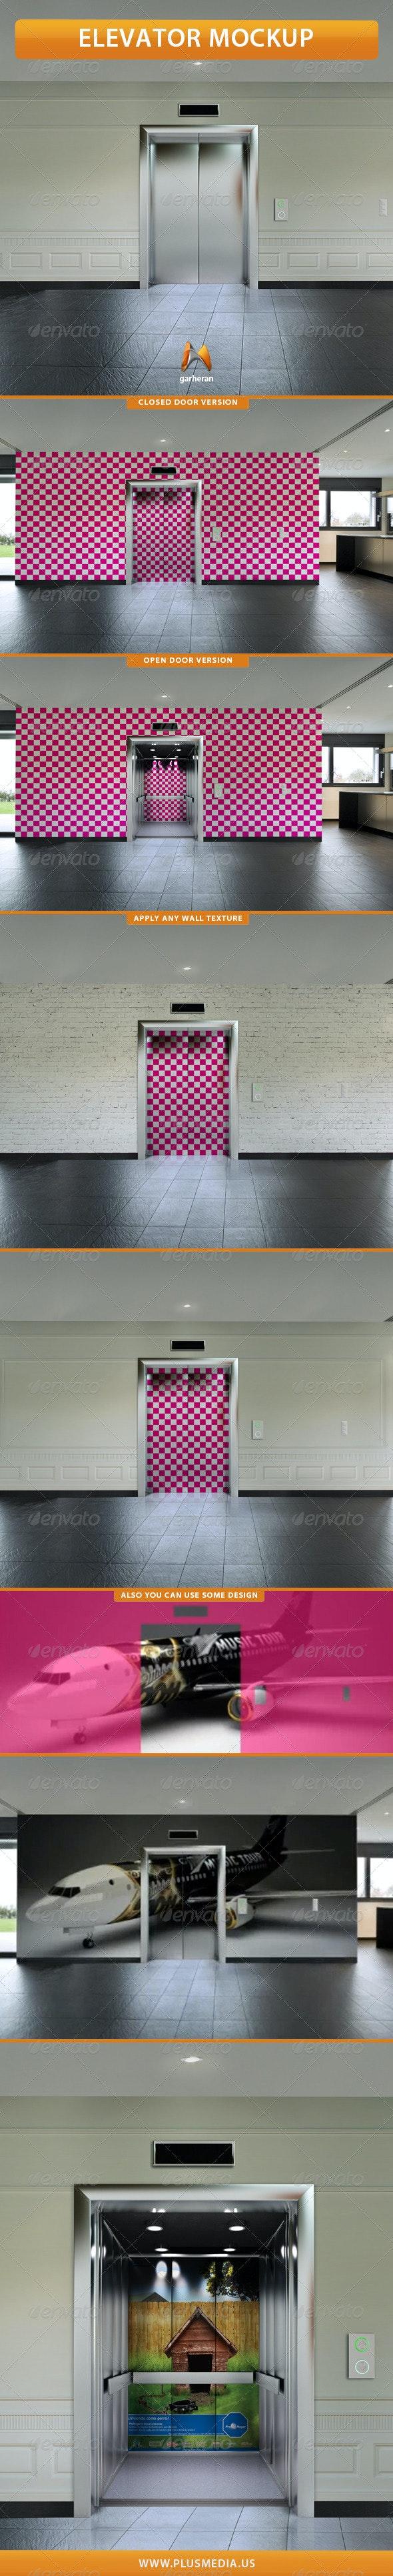 Elevator Mockup - Miscellaneous Print